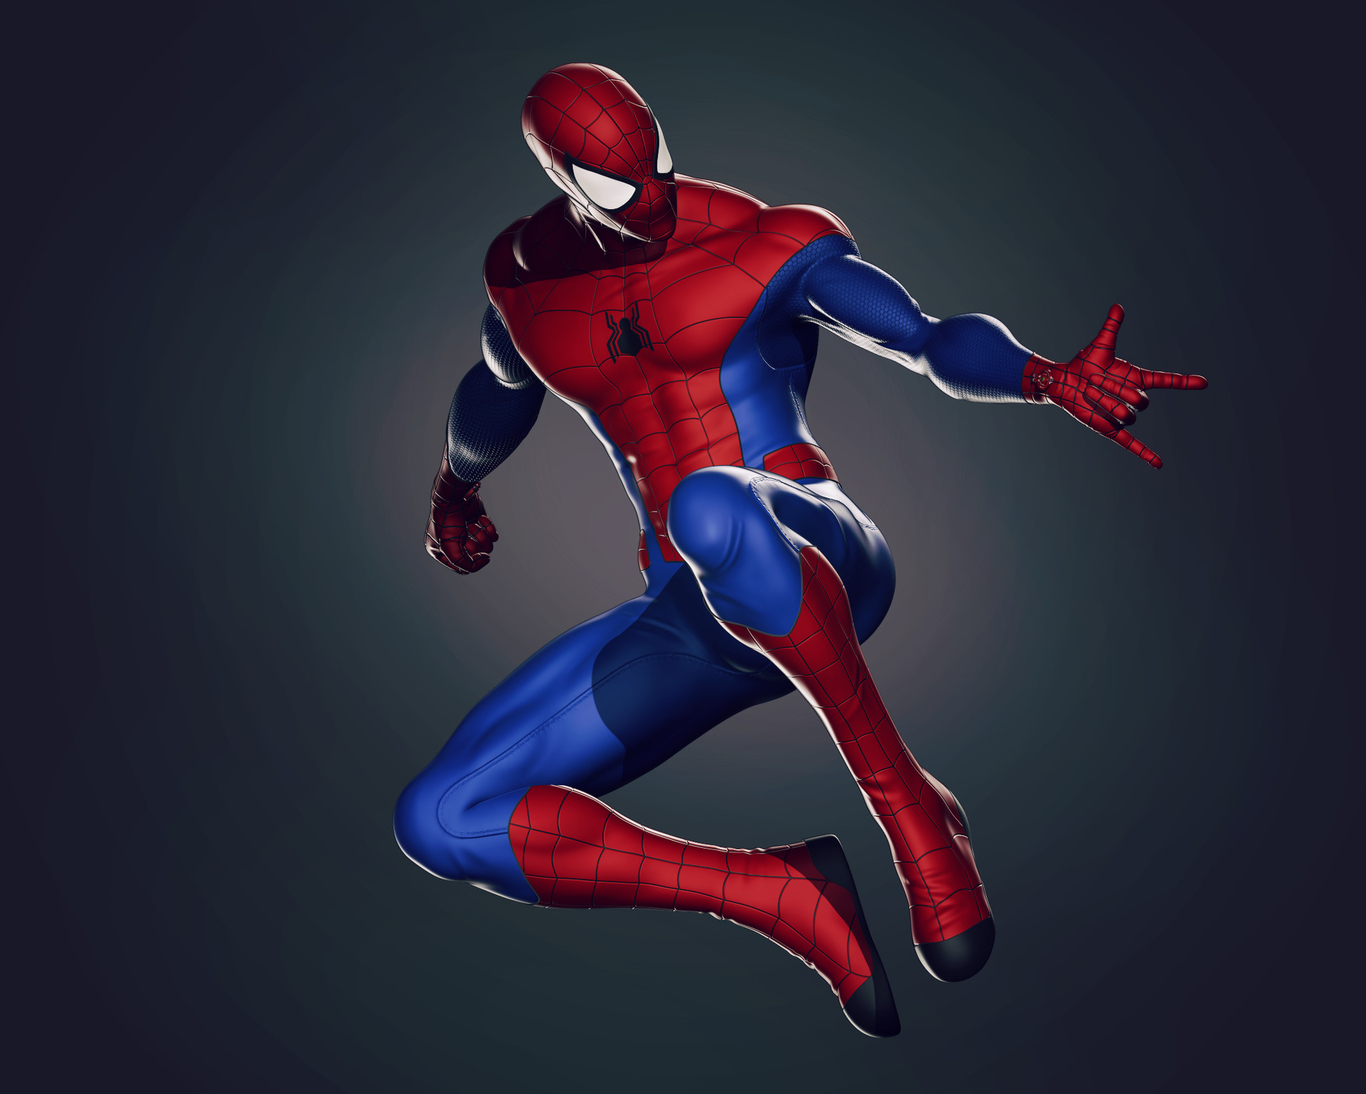 Wgarron23 spider man fan art 1 97ac28e5 t88u